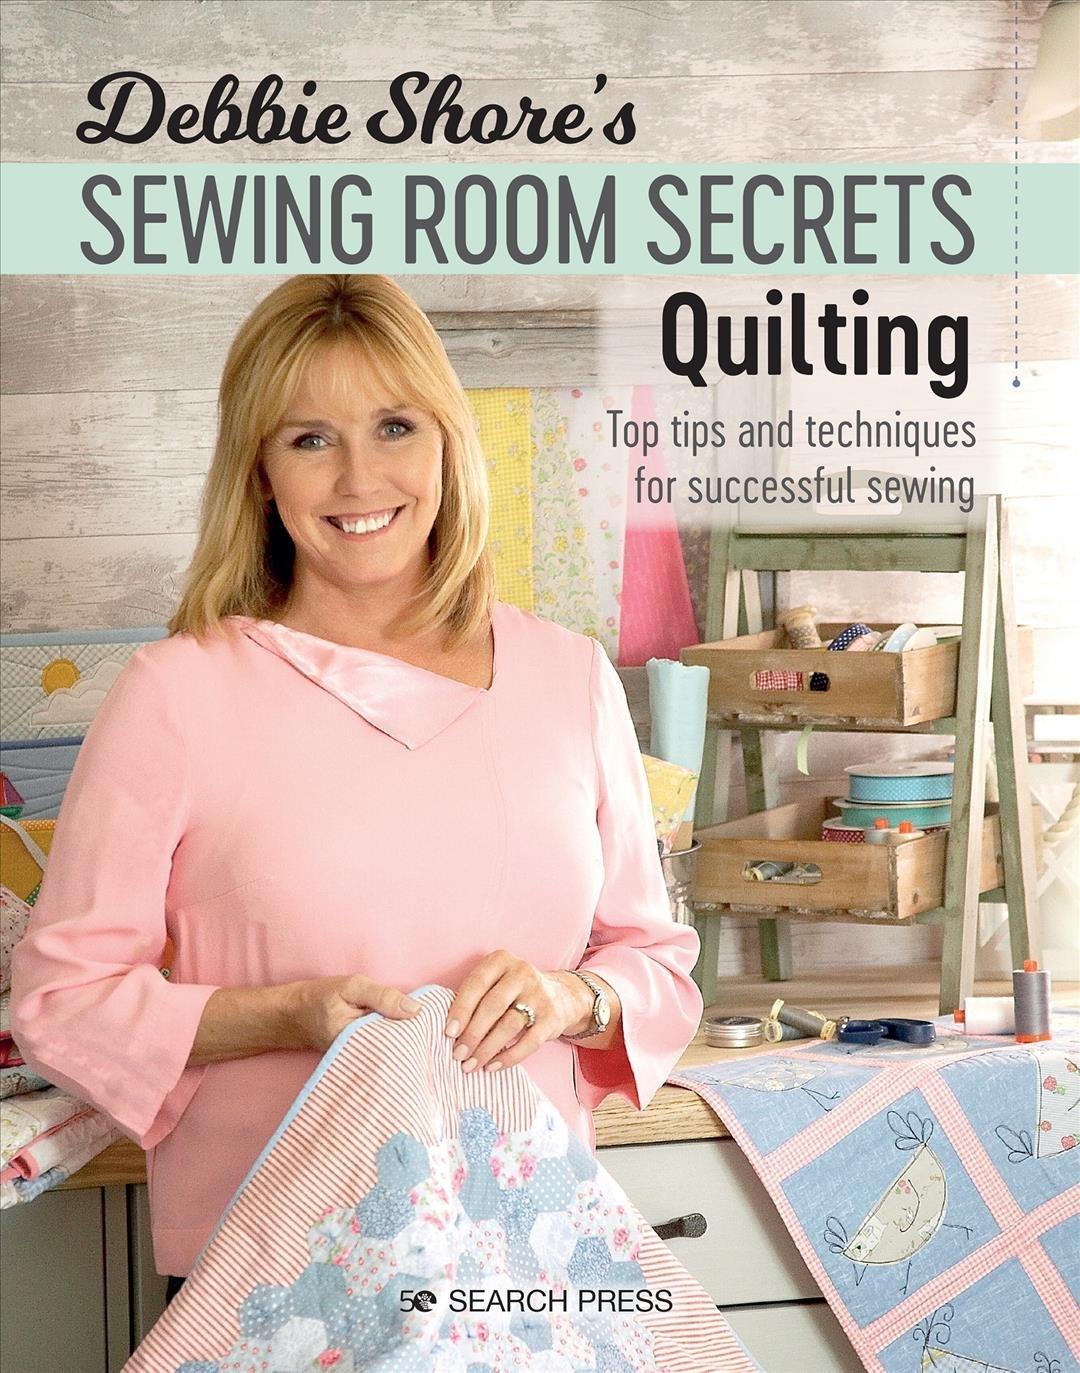 Debbie Shores Sewing Room Secrets: Quilting